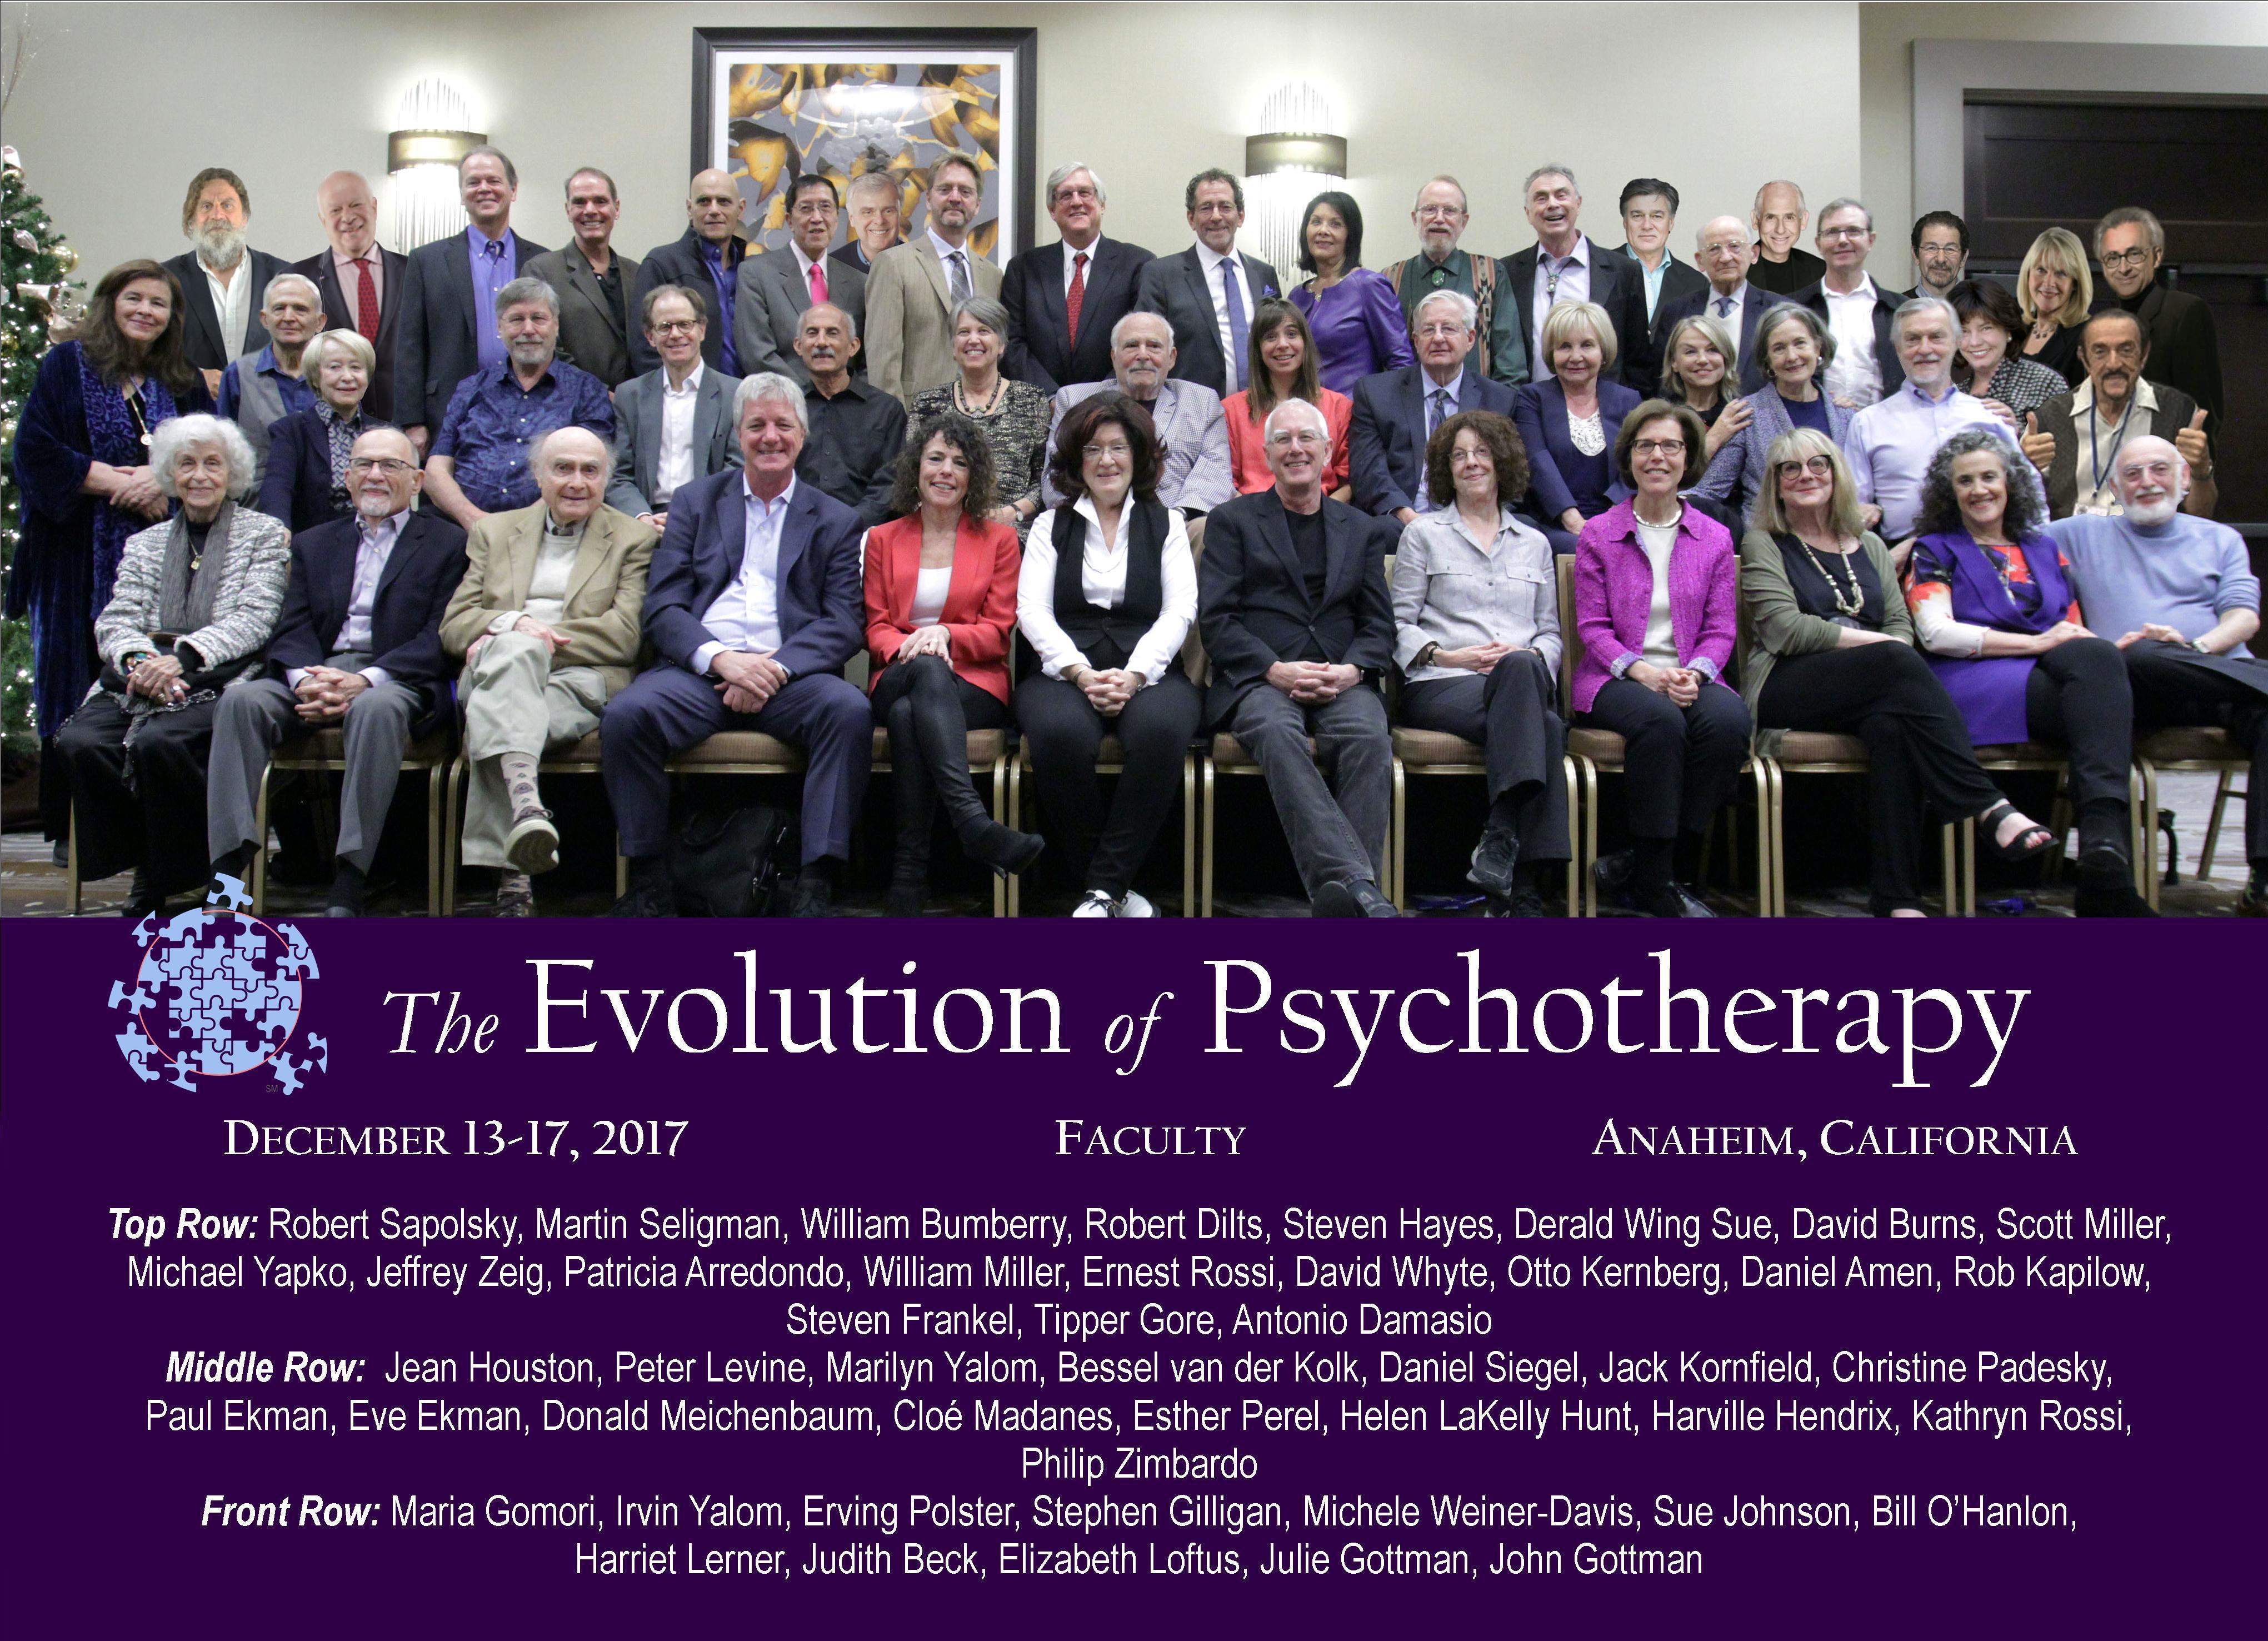 Evolution 2017 Faculty Group Photo